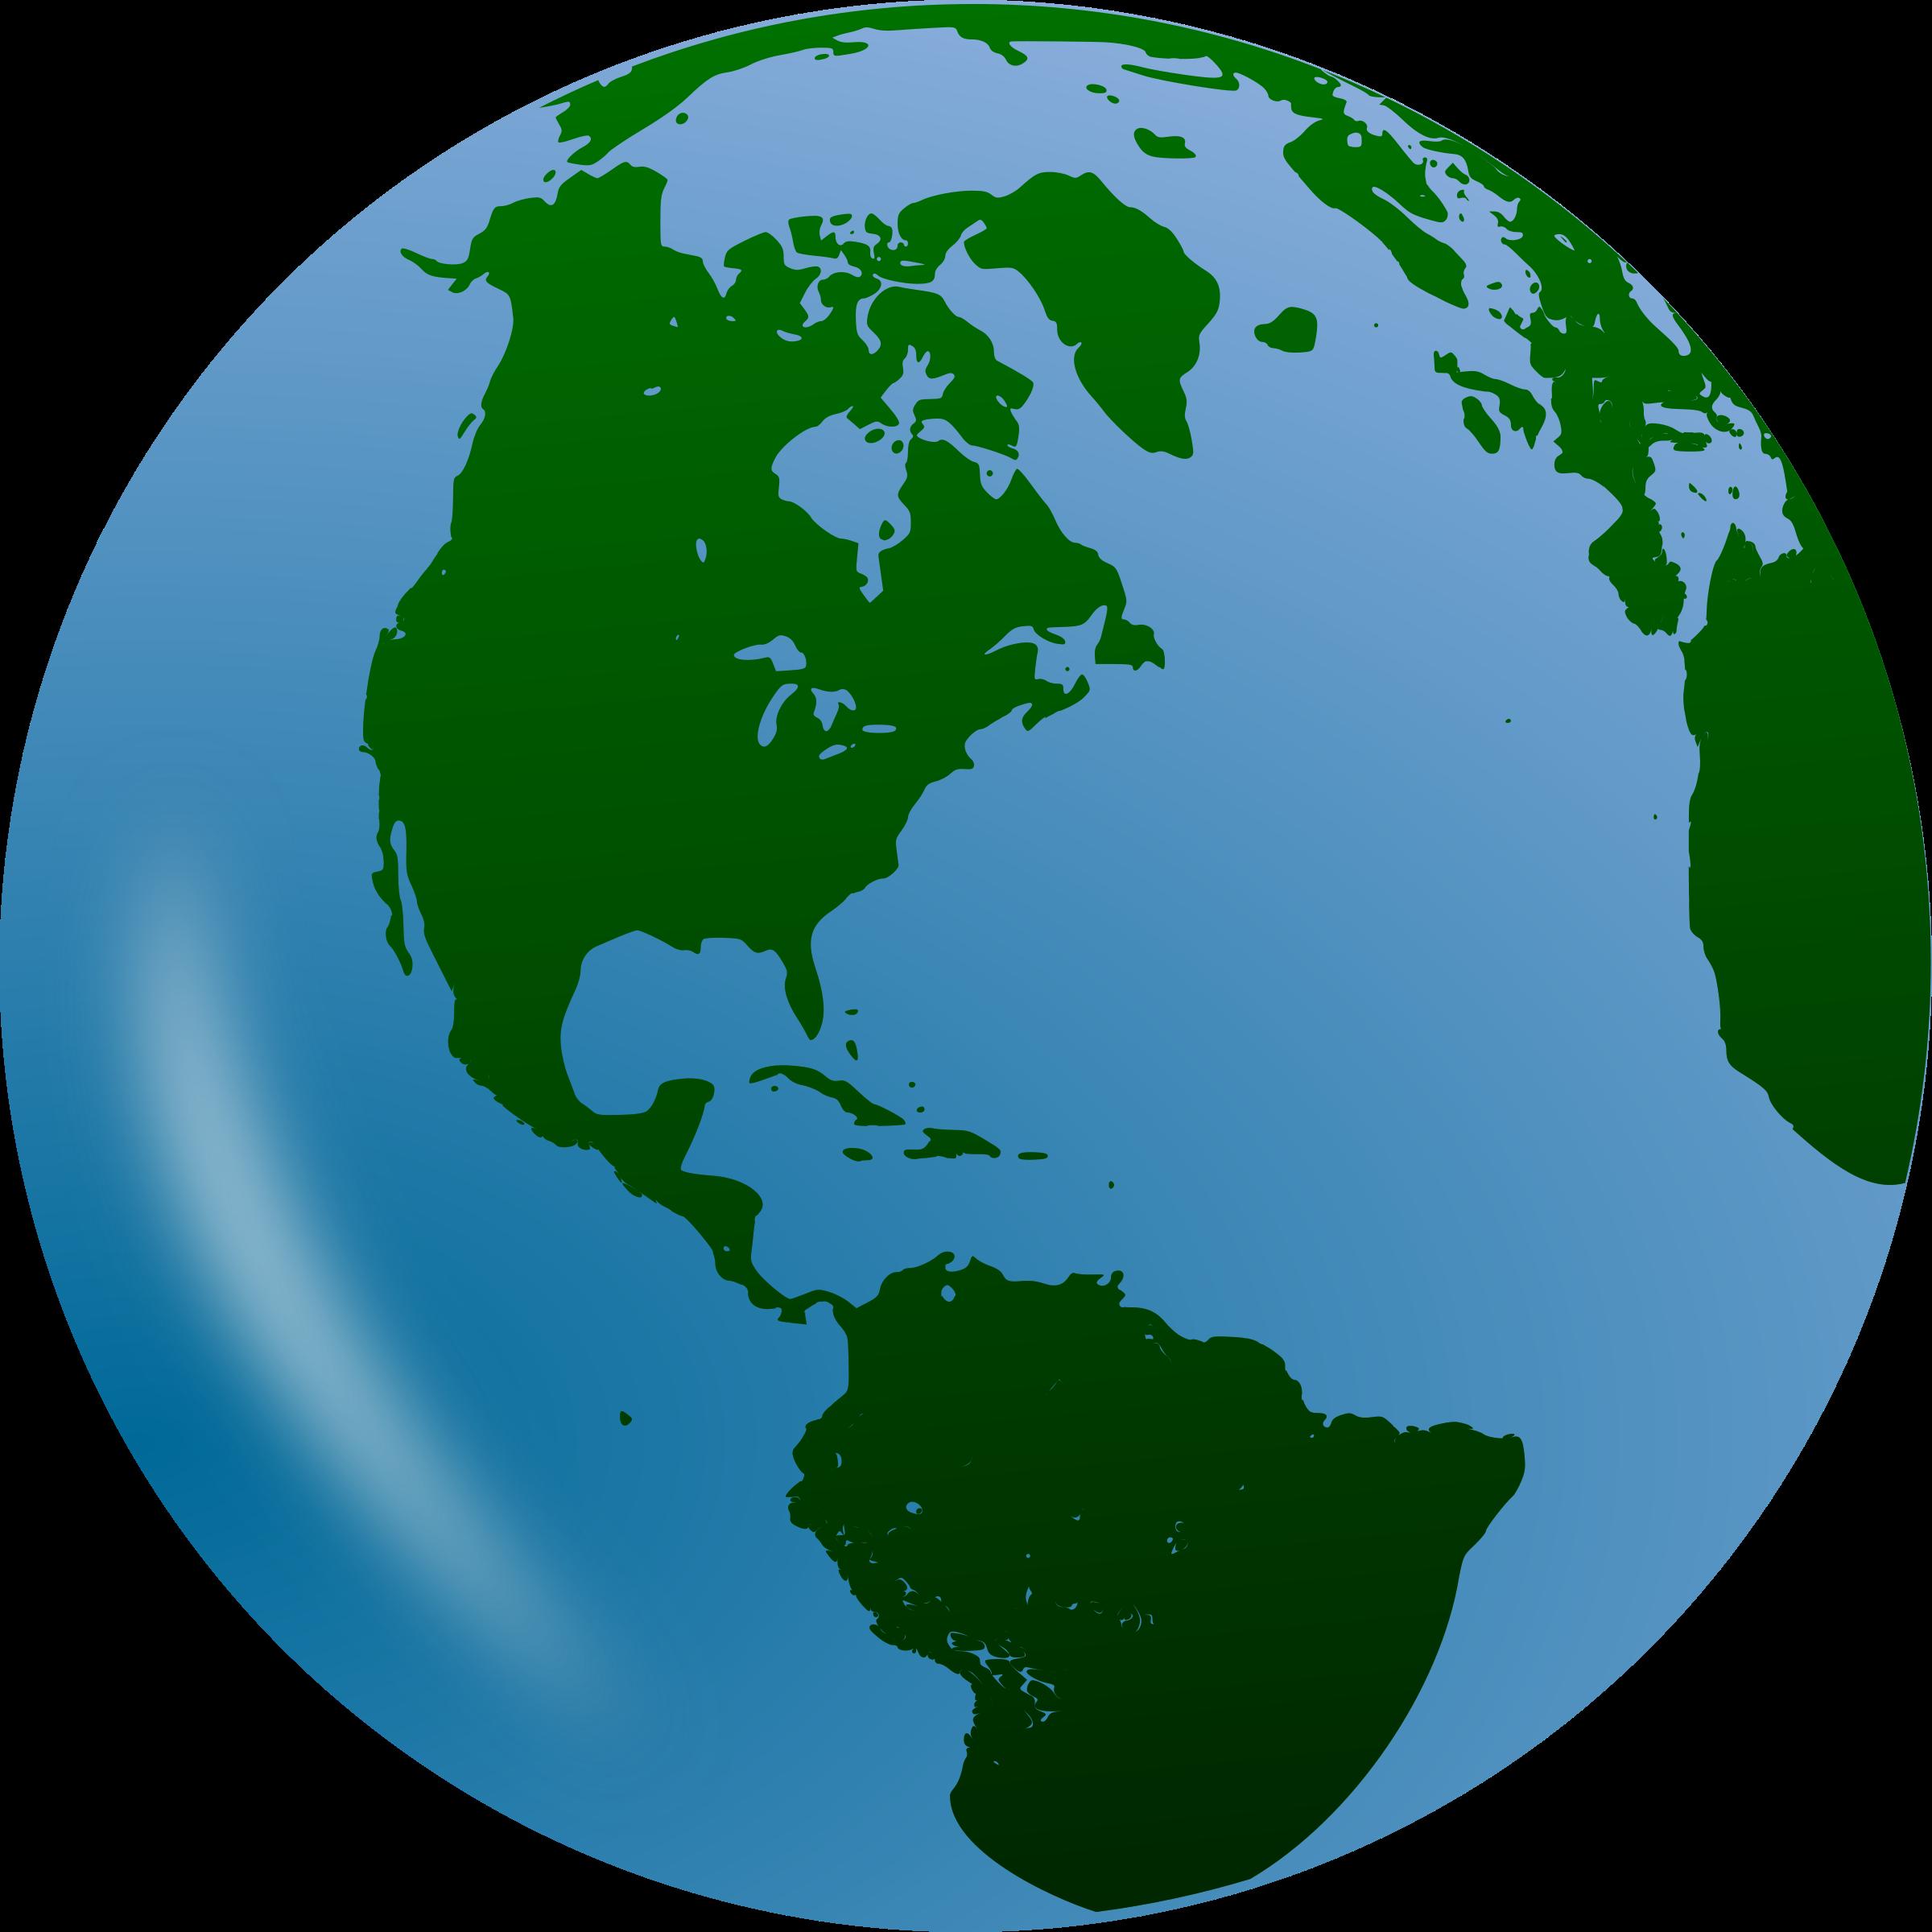 Globe Png image #39535